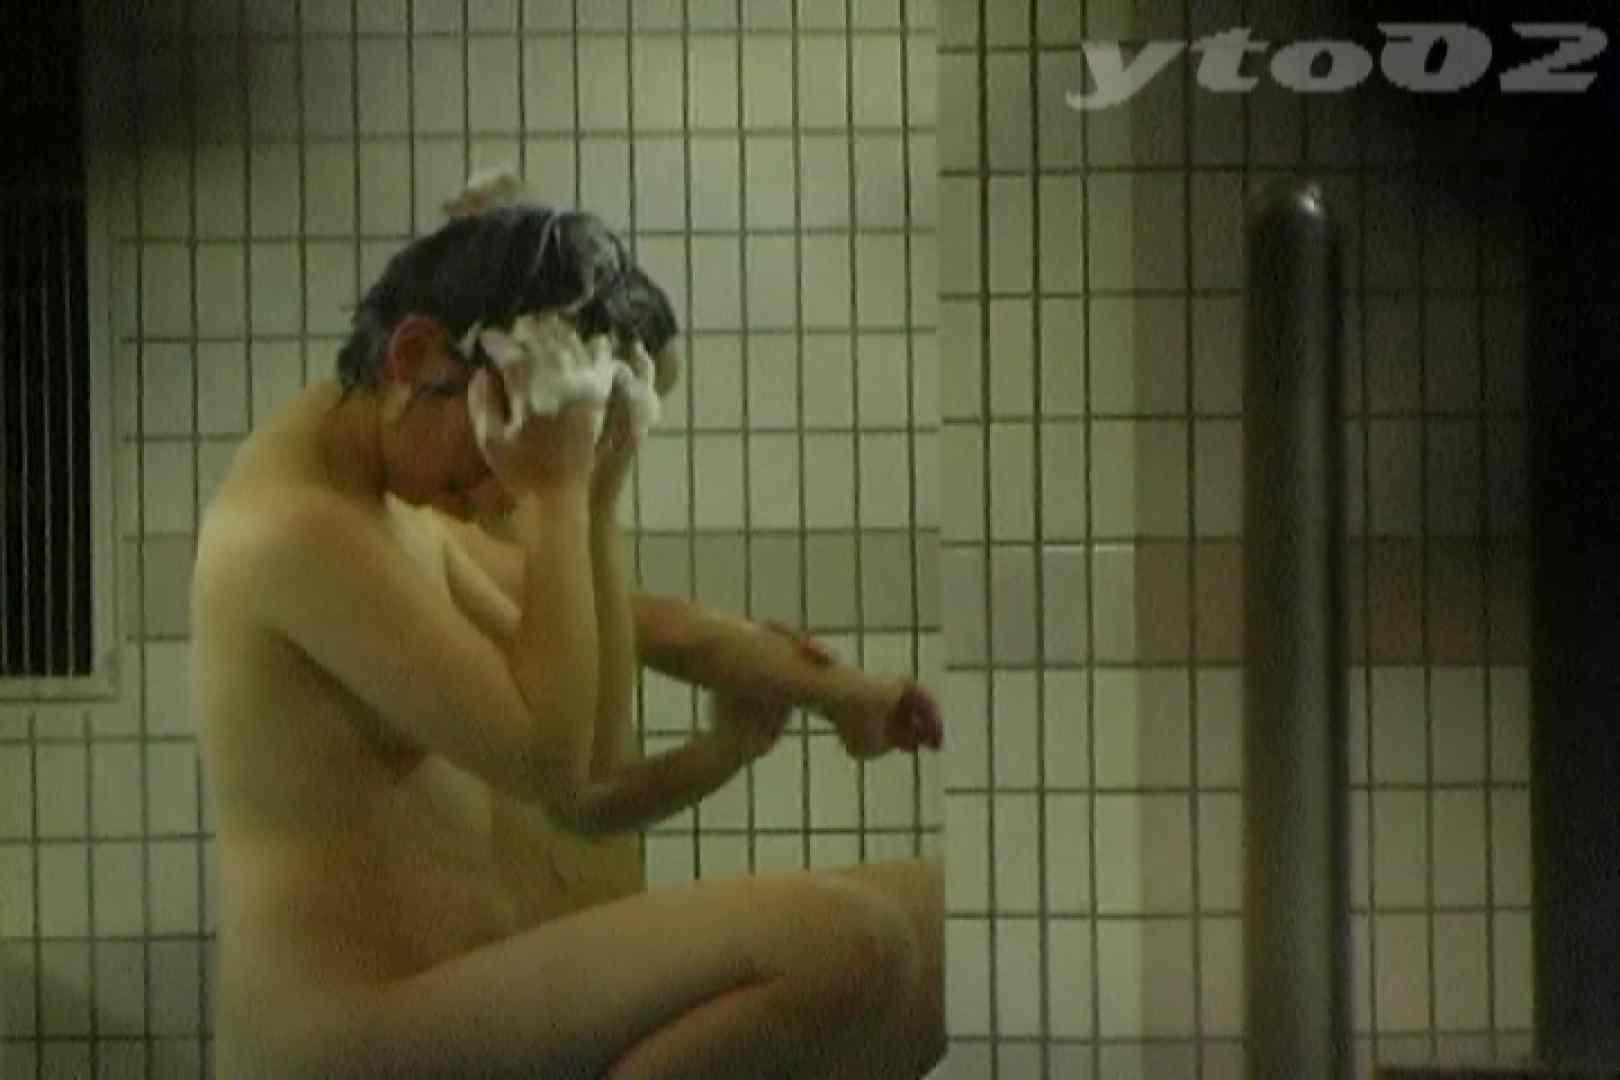 ▲復活限定▲合宿ホテル女風呂盗撮 Vol.11 入浴  79pic 25